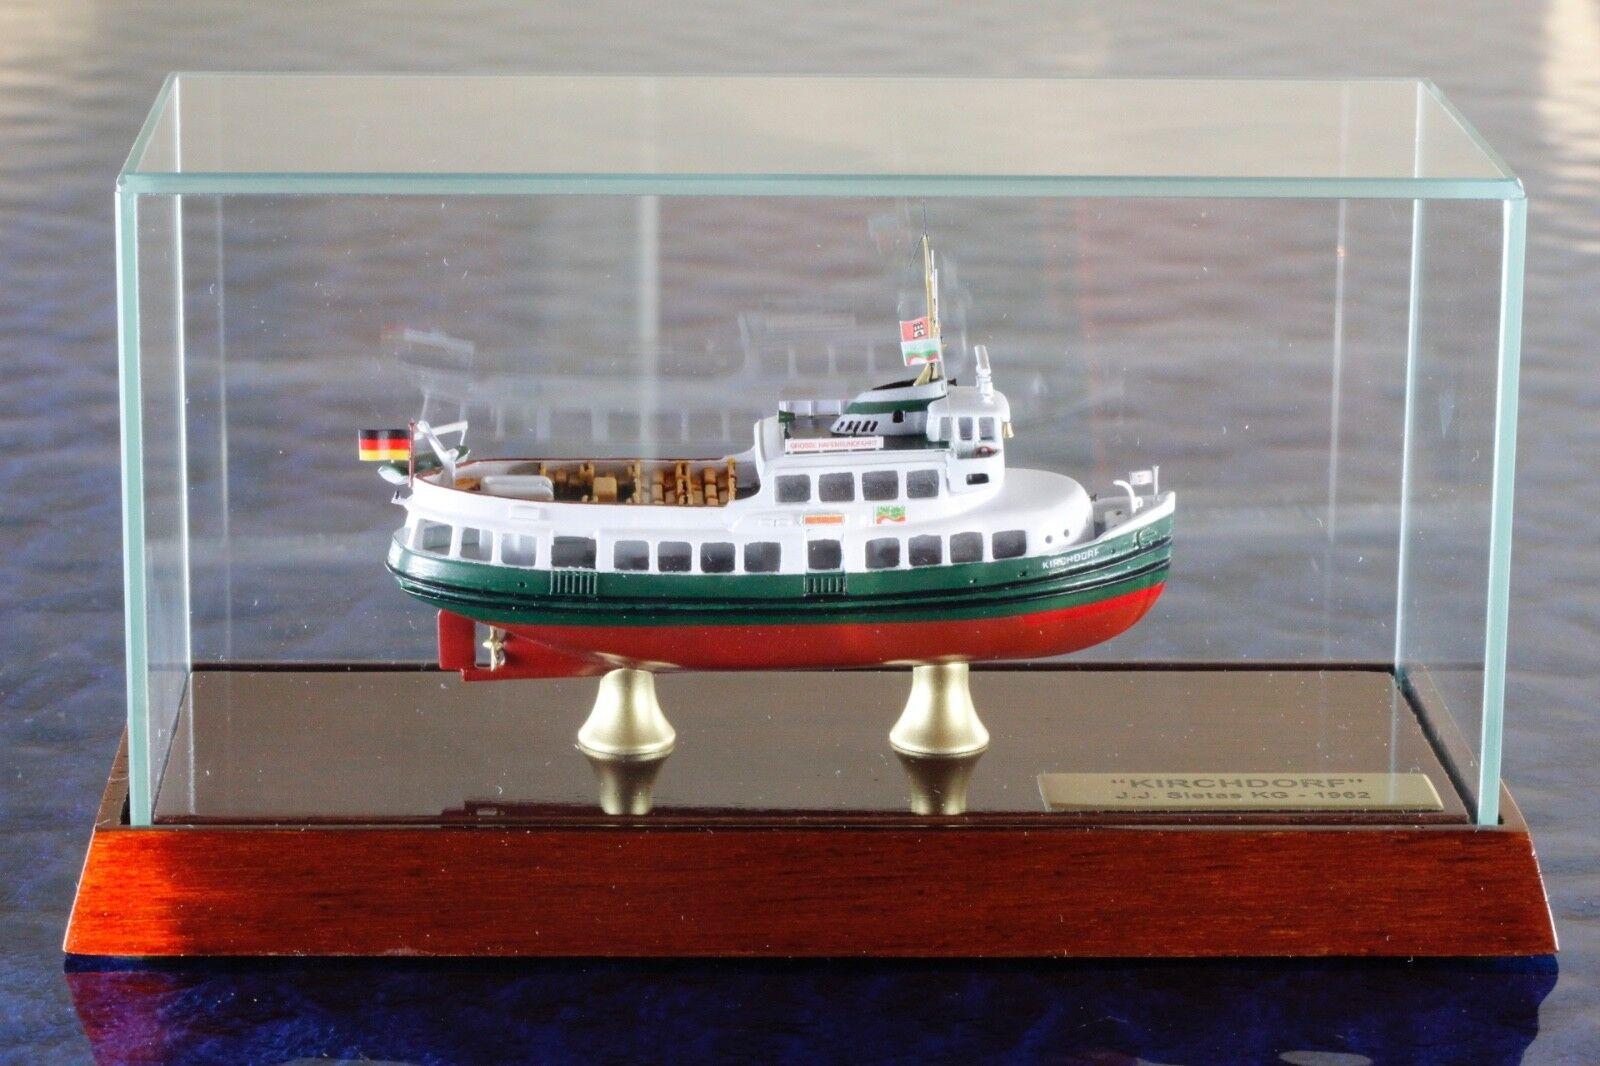 Kirchdorf fabricante Classic ship Collection 4159vr, 1 400 1 1250 barco modelo